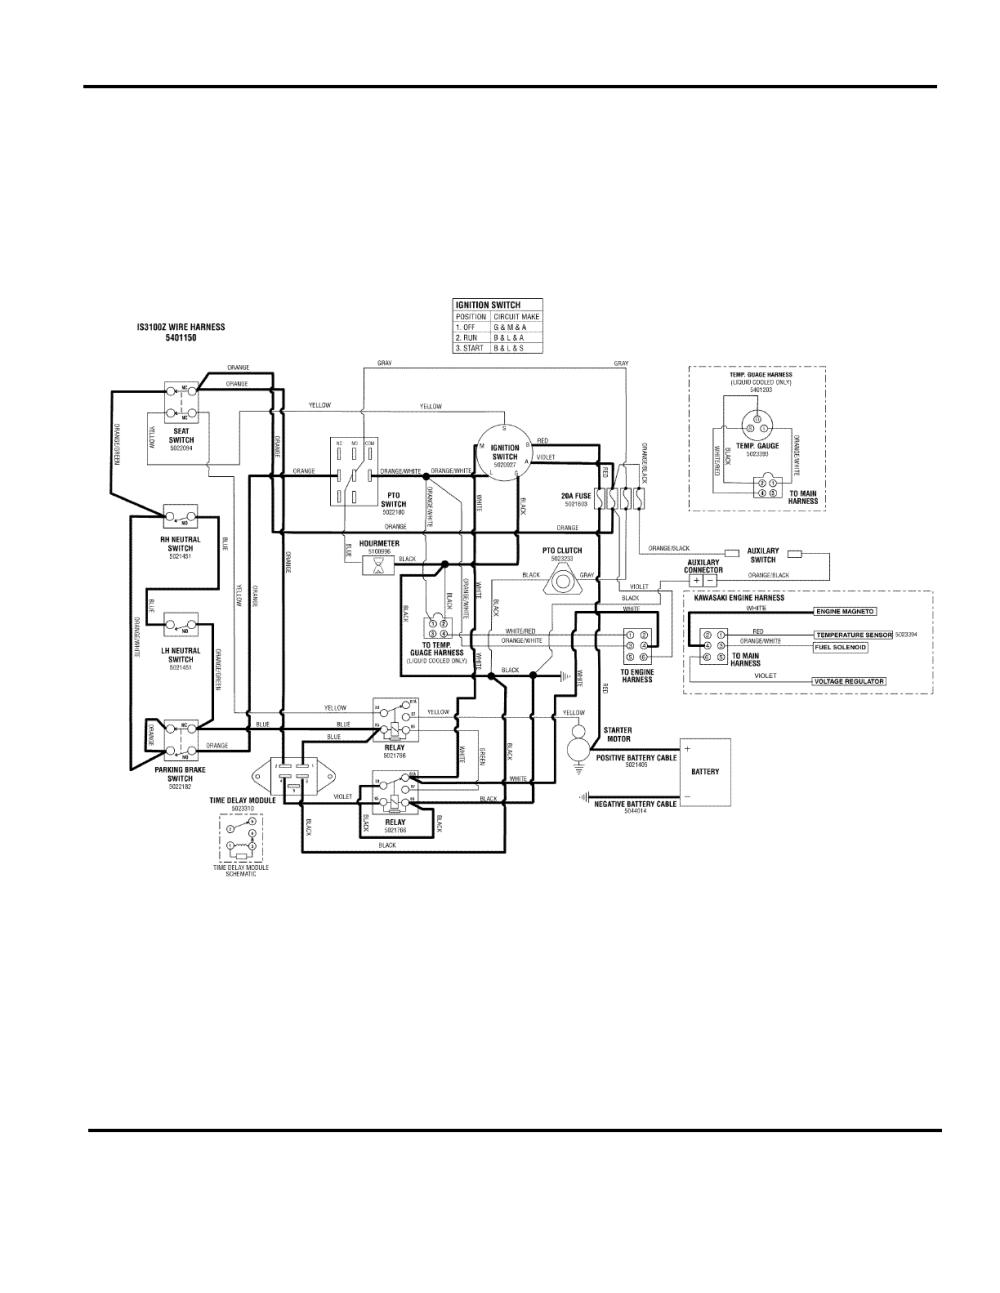 medium resolution of ferris mower wiring diagram wiring library rh 49 webseiten archiv de ferris is1500z wiring diagram ferris